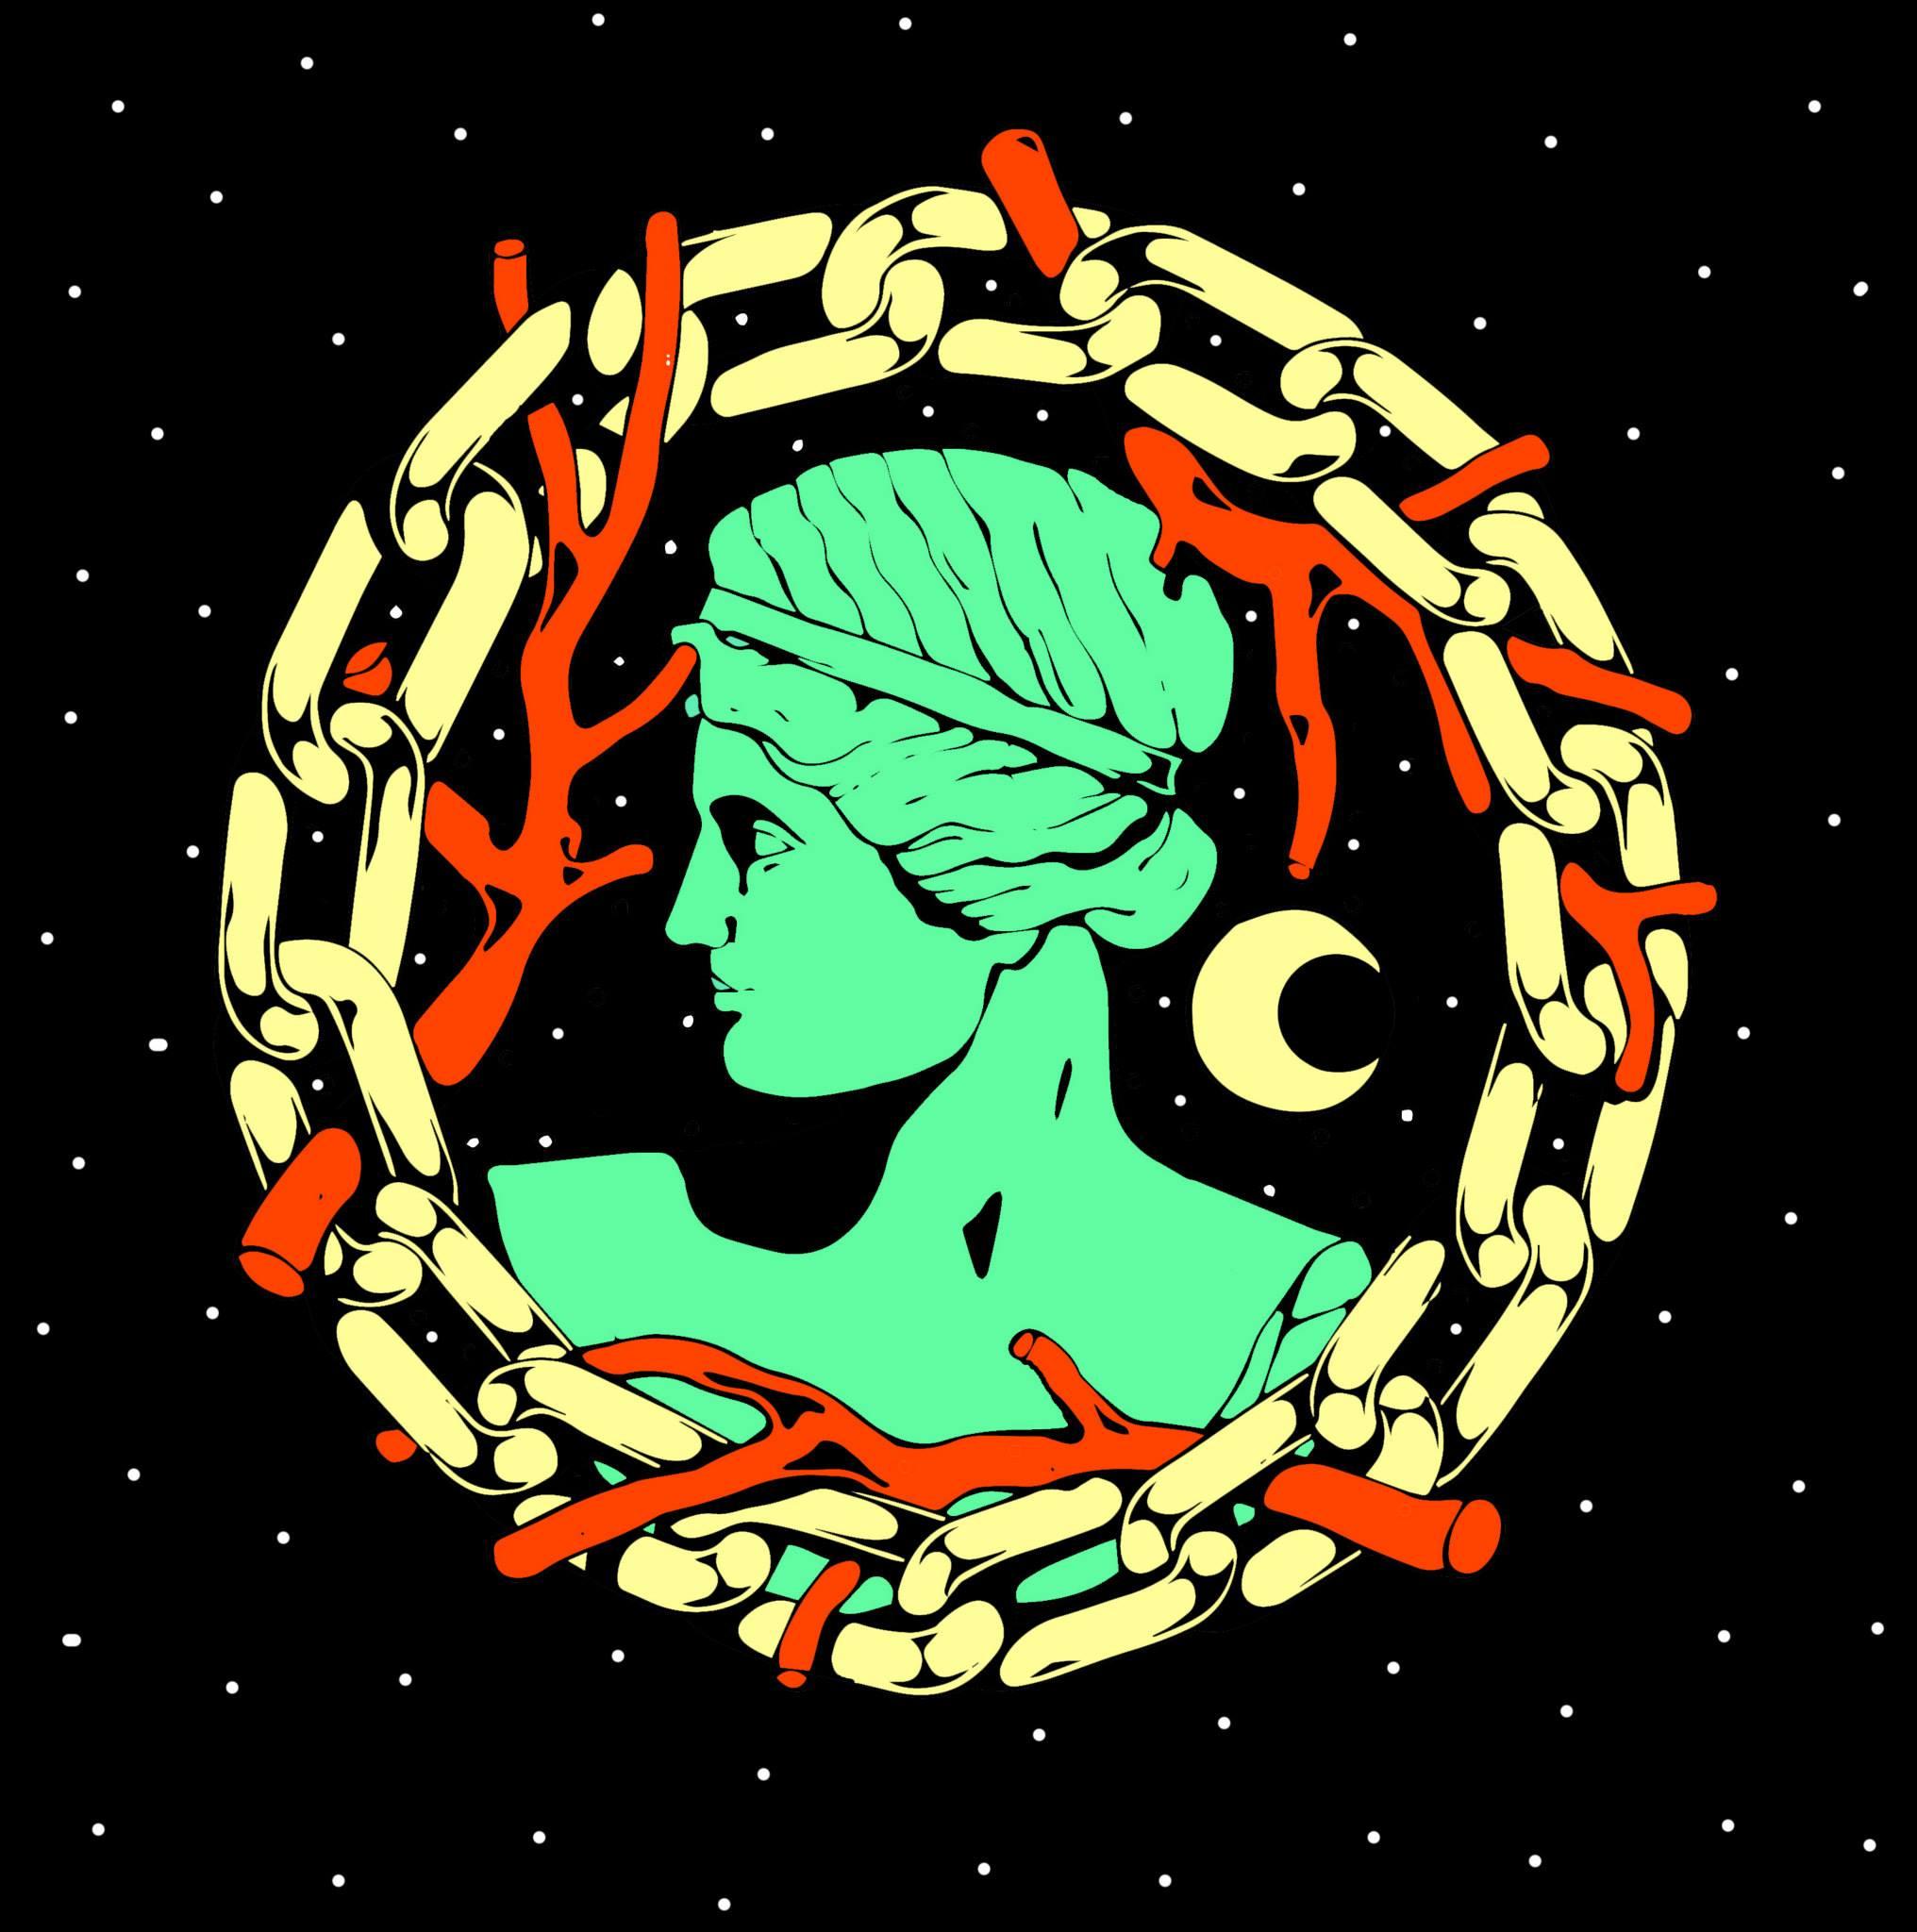 Aloha logo belize